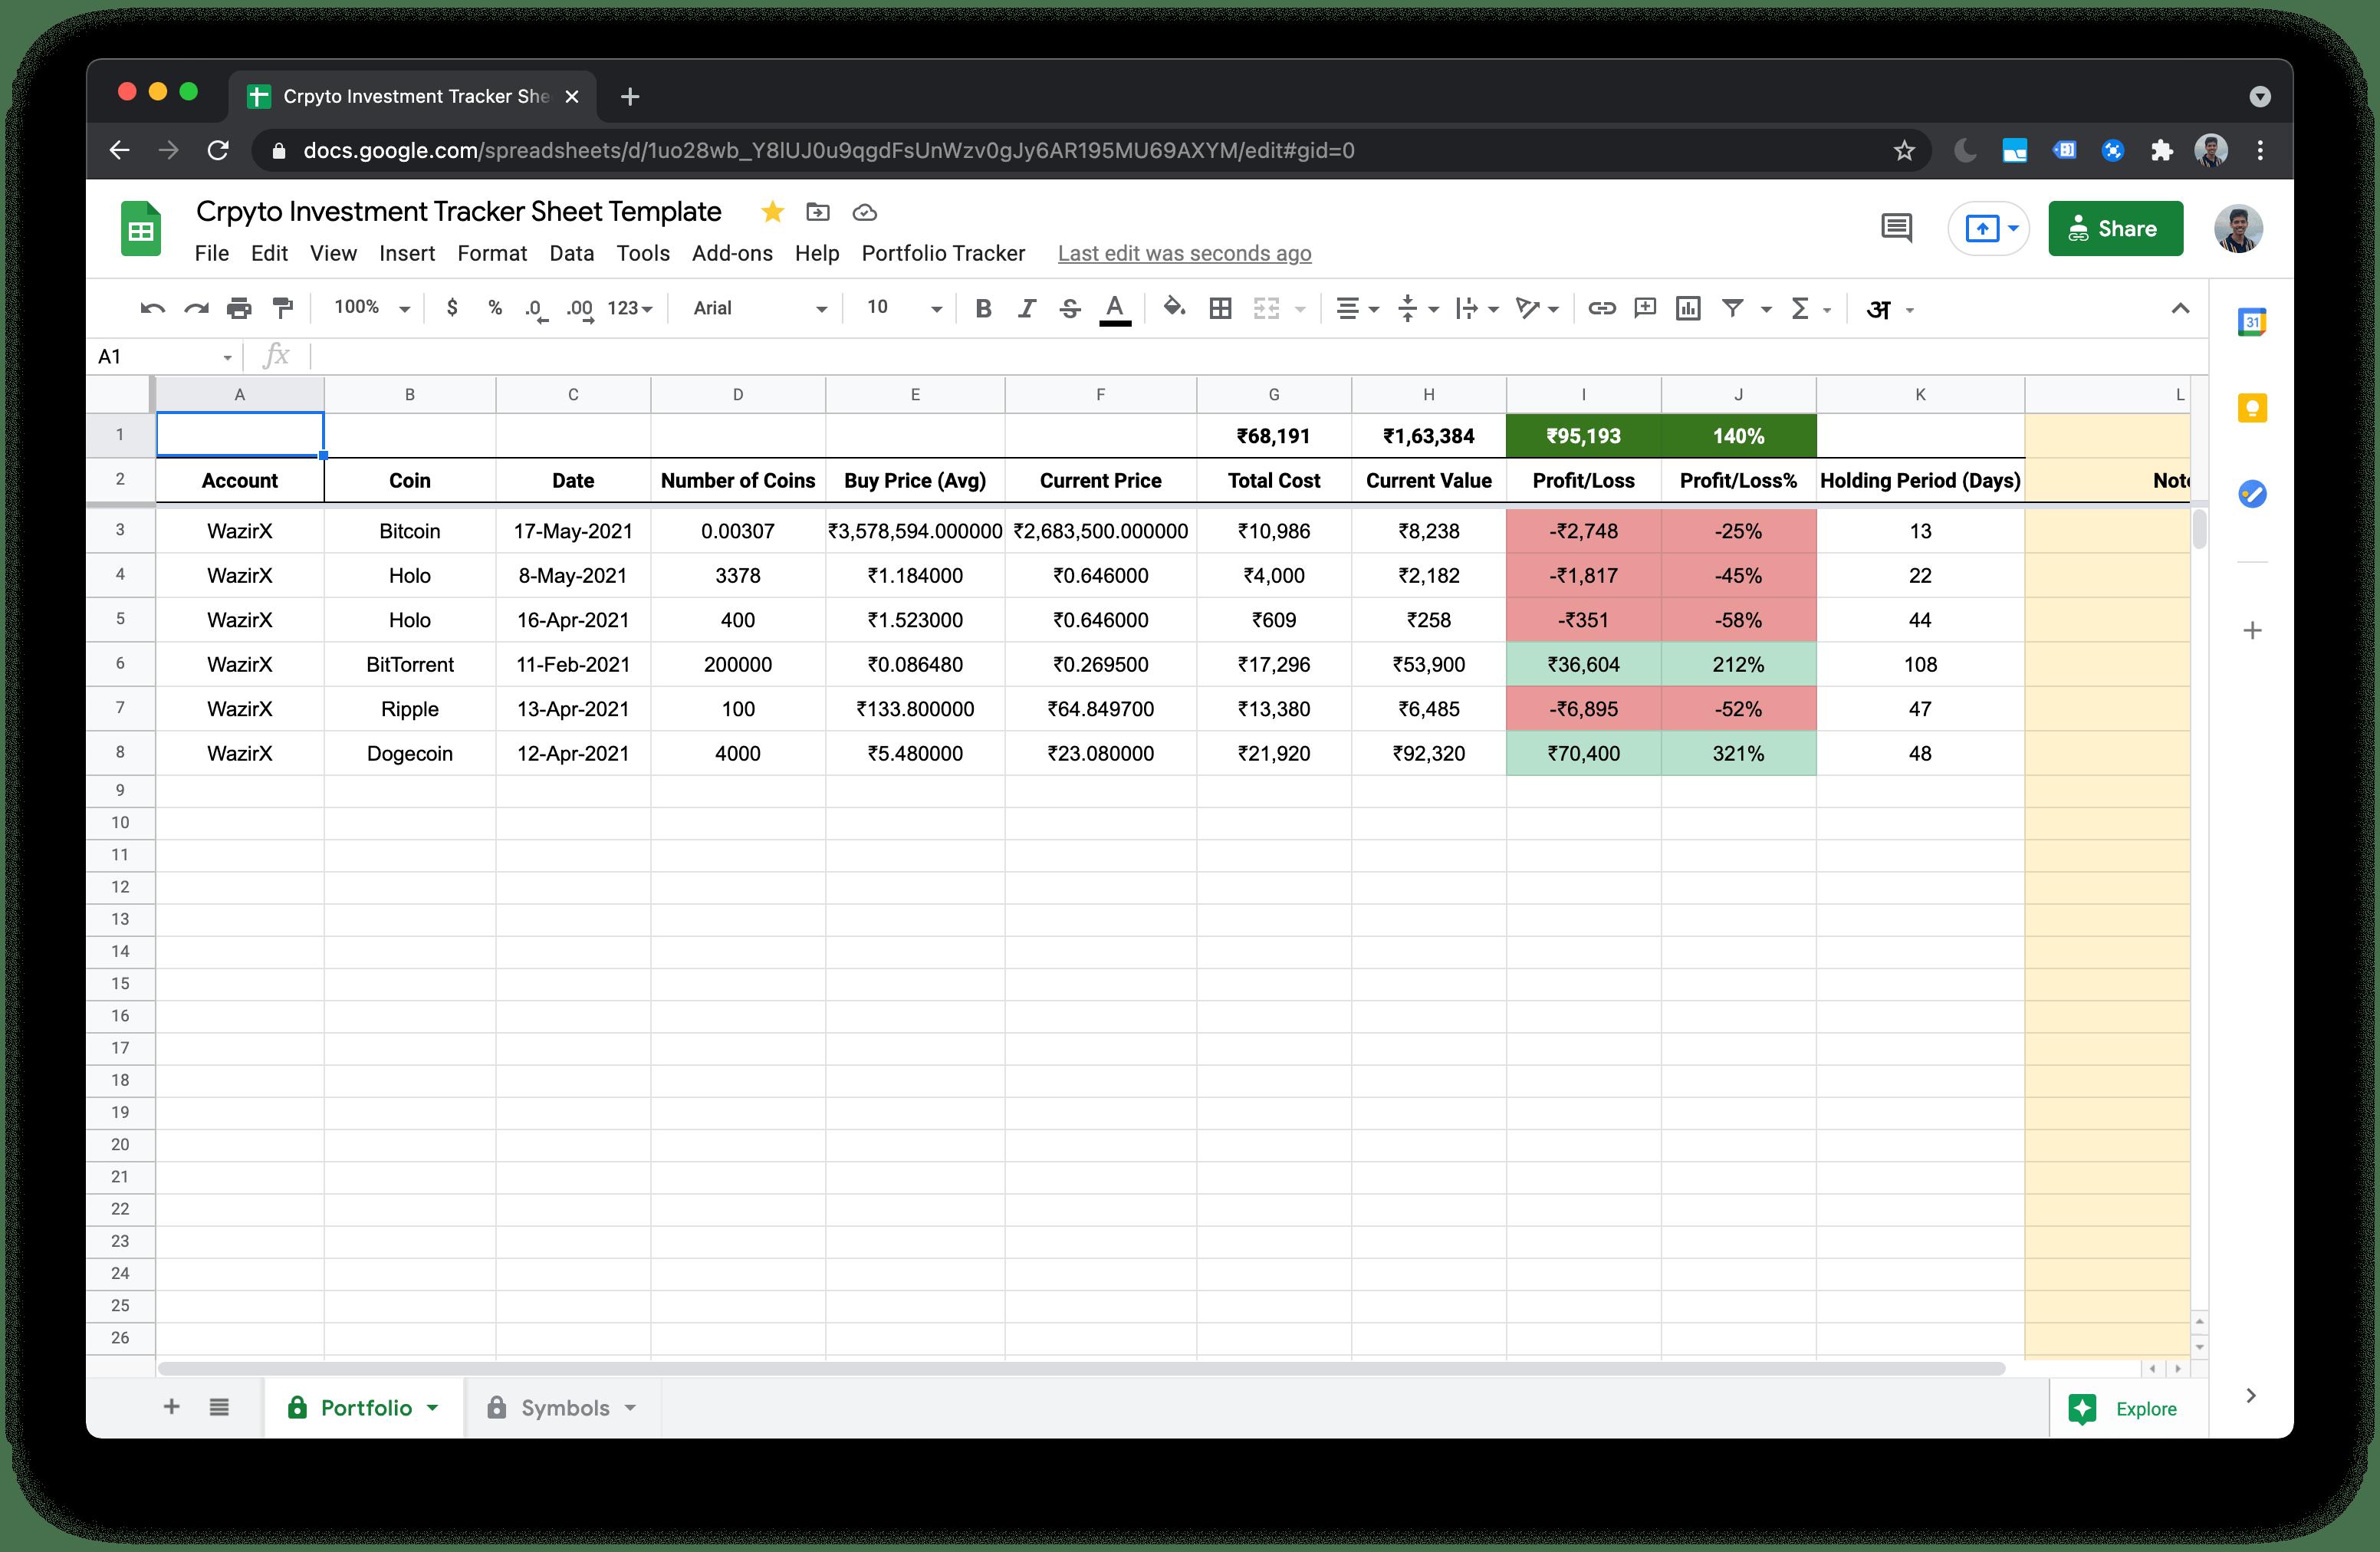 Screenshot of the Crpyto portfolio tracker sheet offered by codegena.com